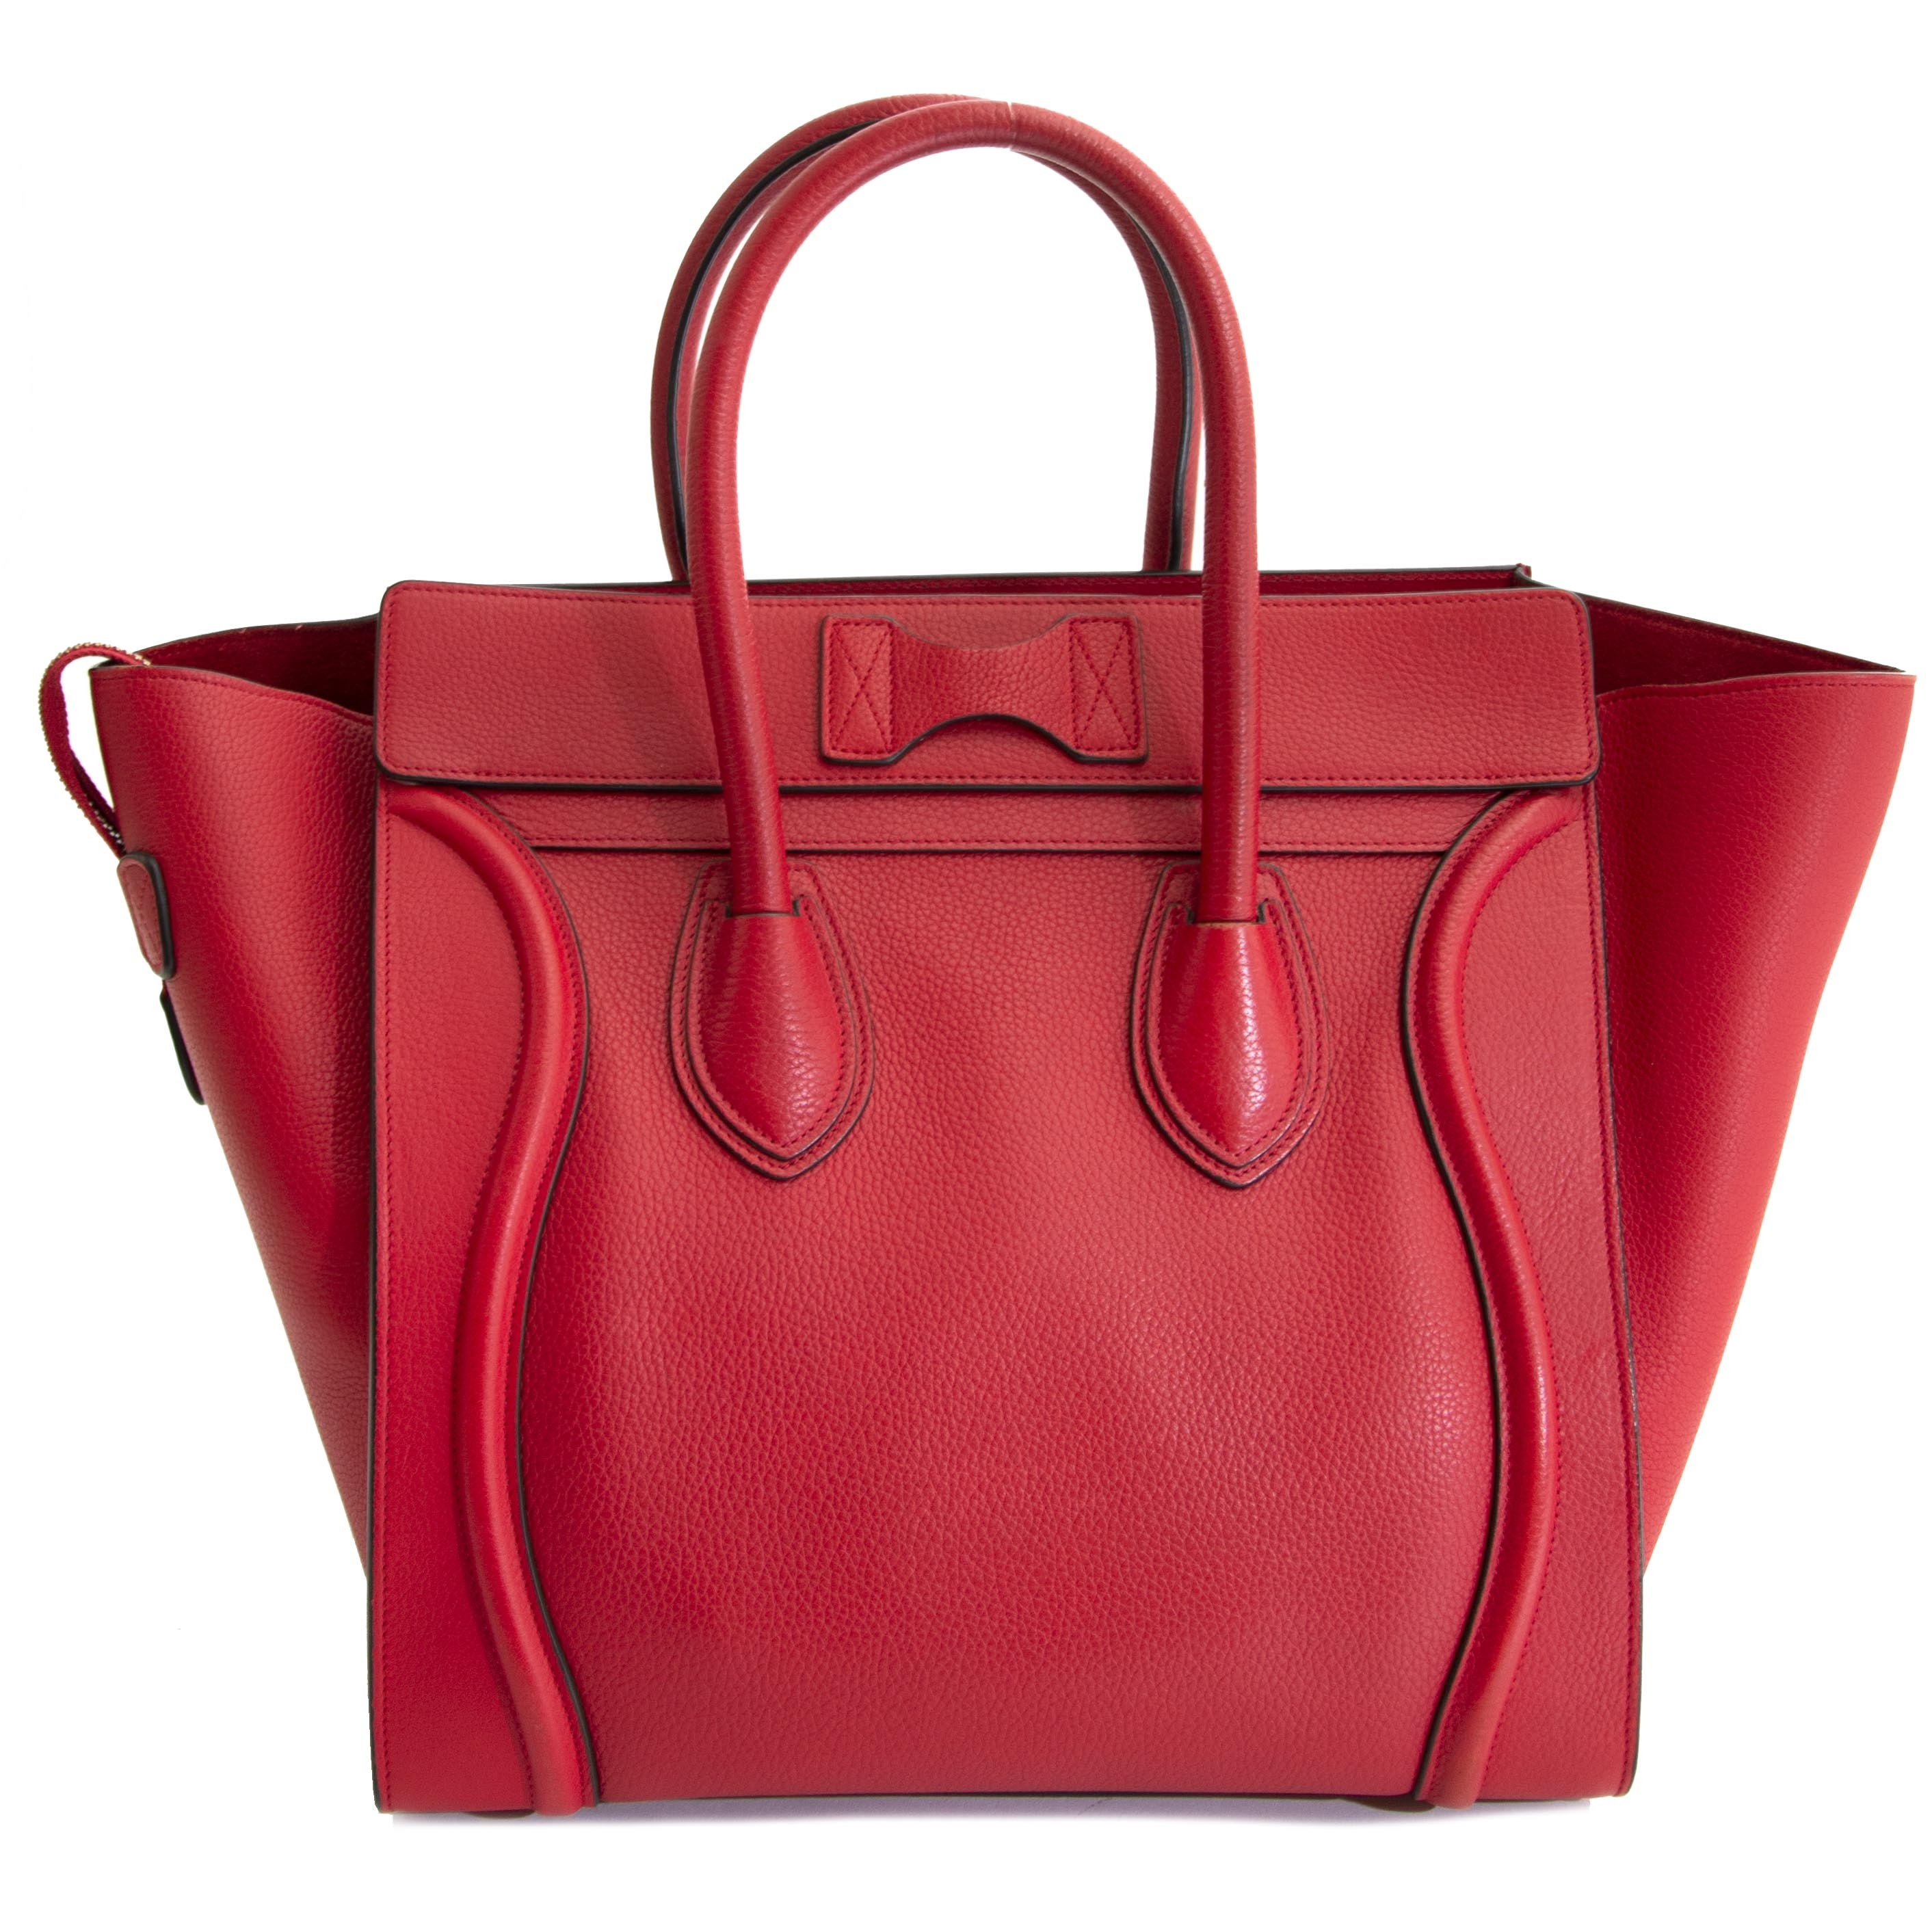 1ca5cdf53c authentic second hand vintage Céline Luggage Bag Red online webshop LabelLOV  Koop authentieke tweedehands Céline Luggage Bag Red online webshop LabelLOV